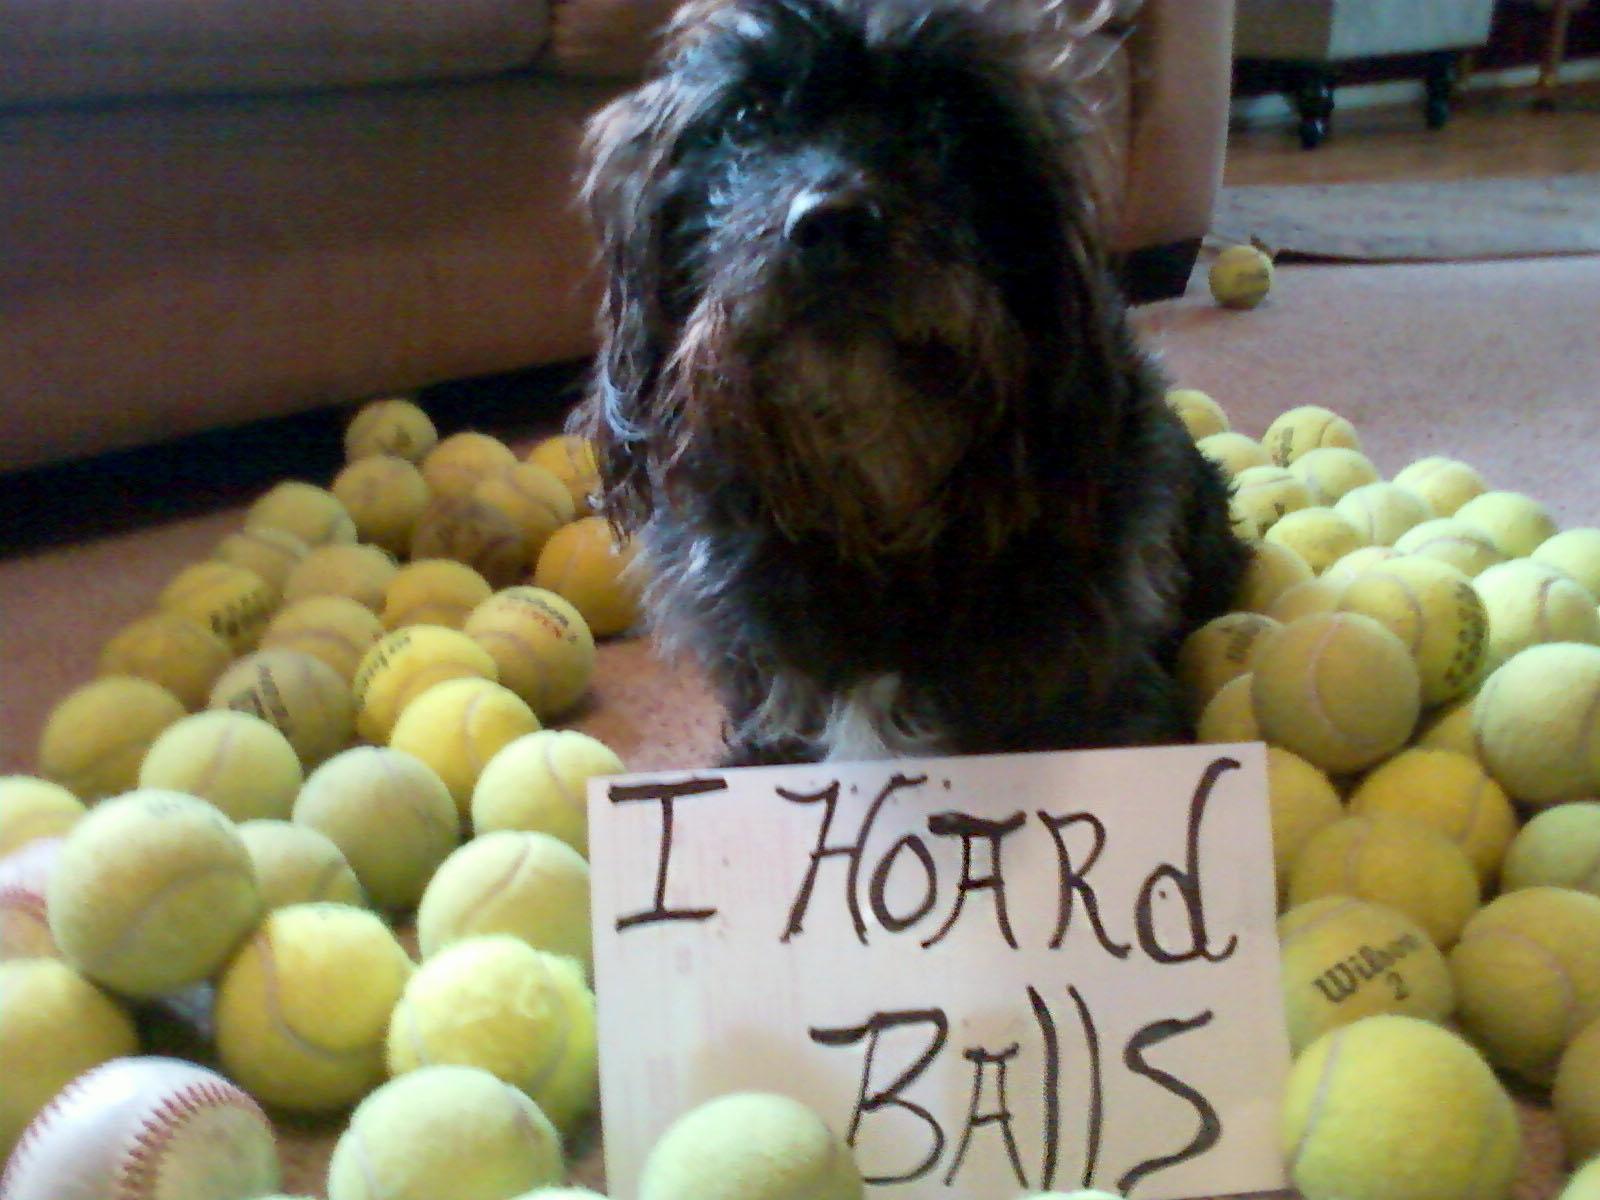 dog hoarding tennis balls